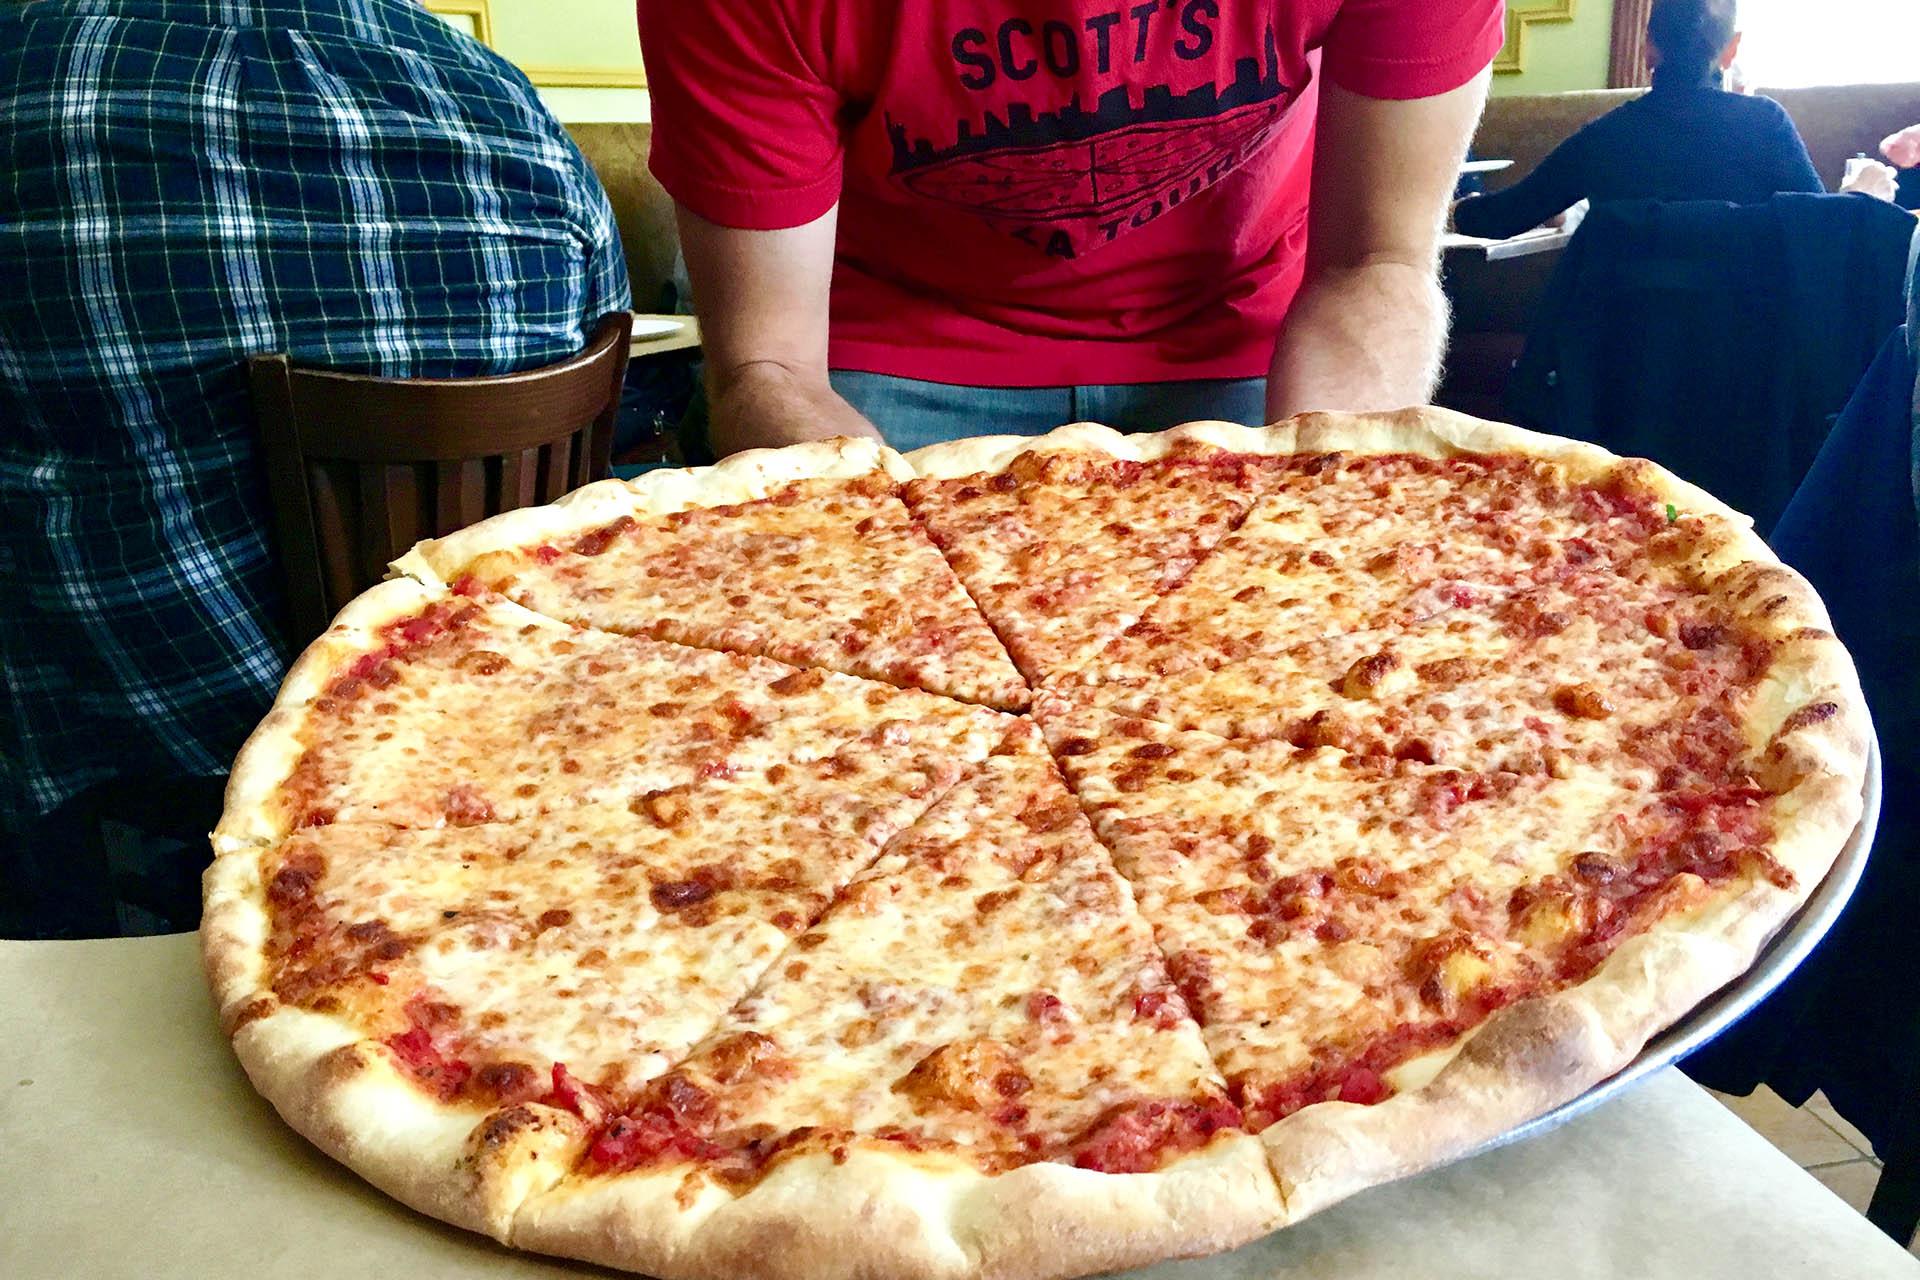 scott's pizza tours nyc dani's pizza kew gardens